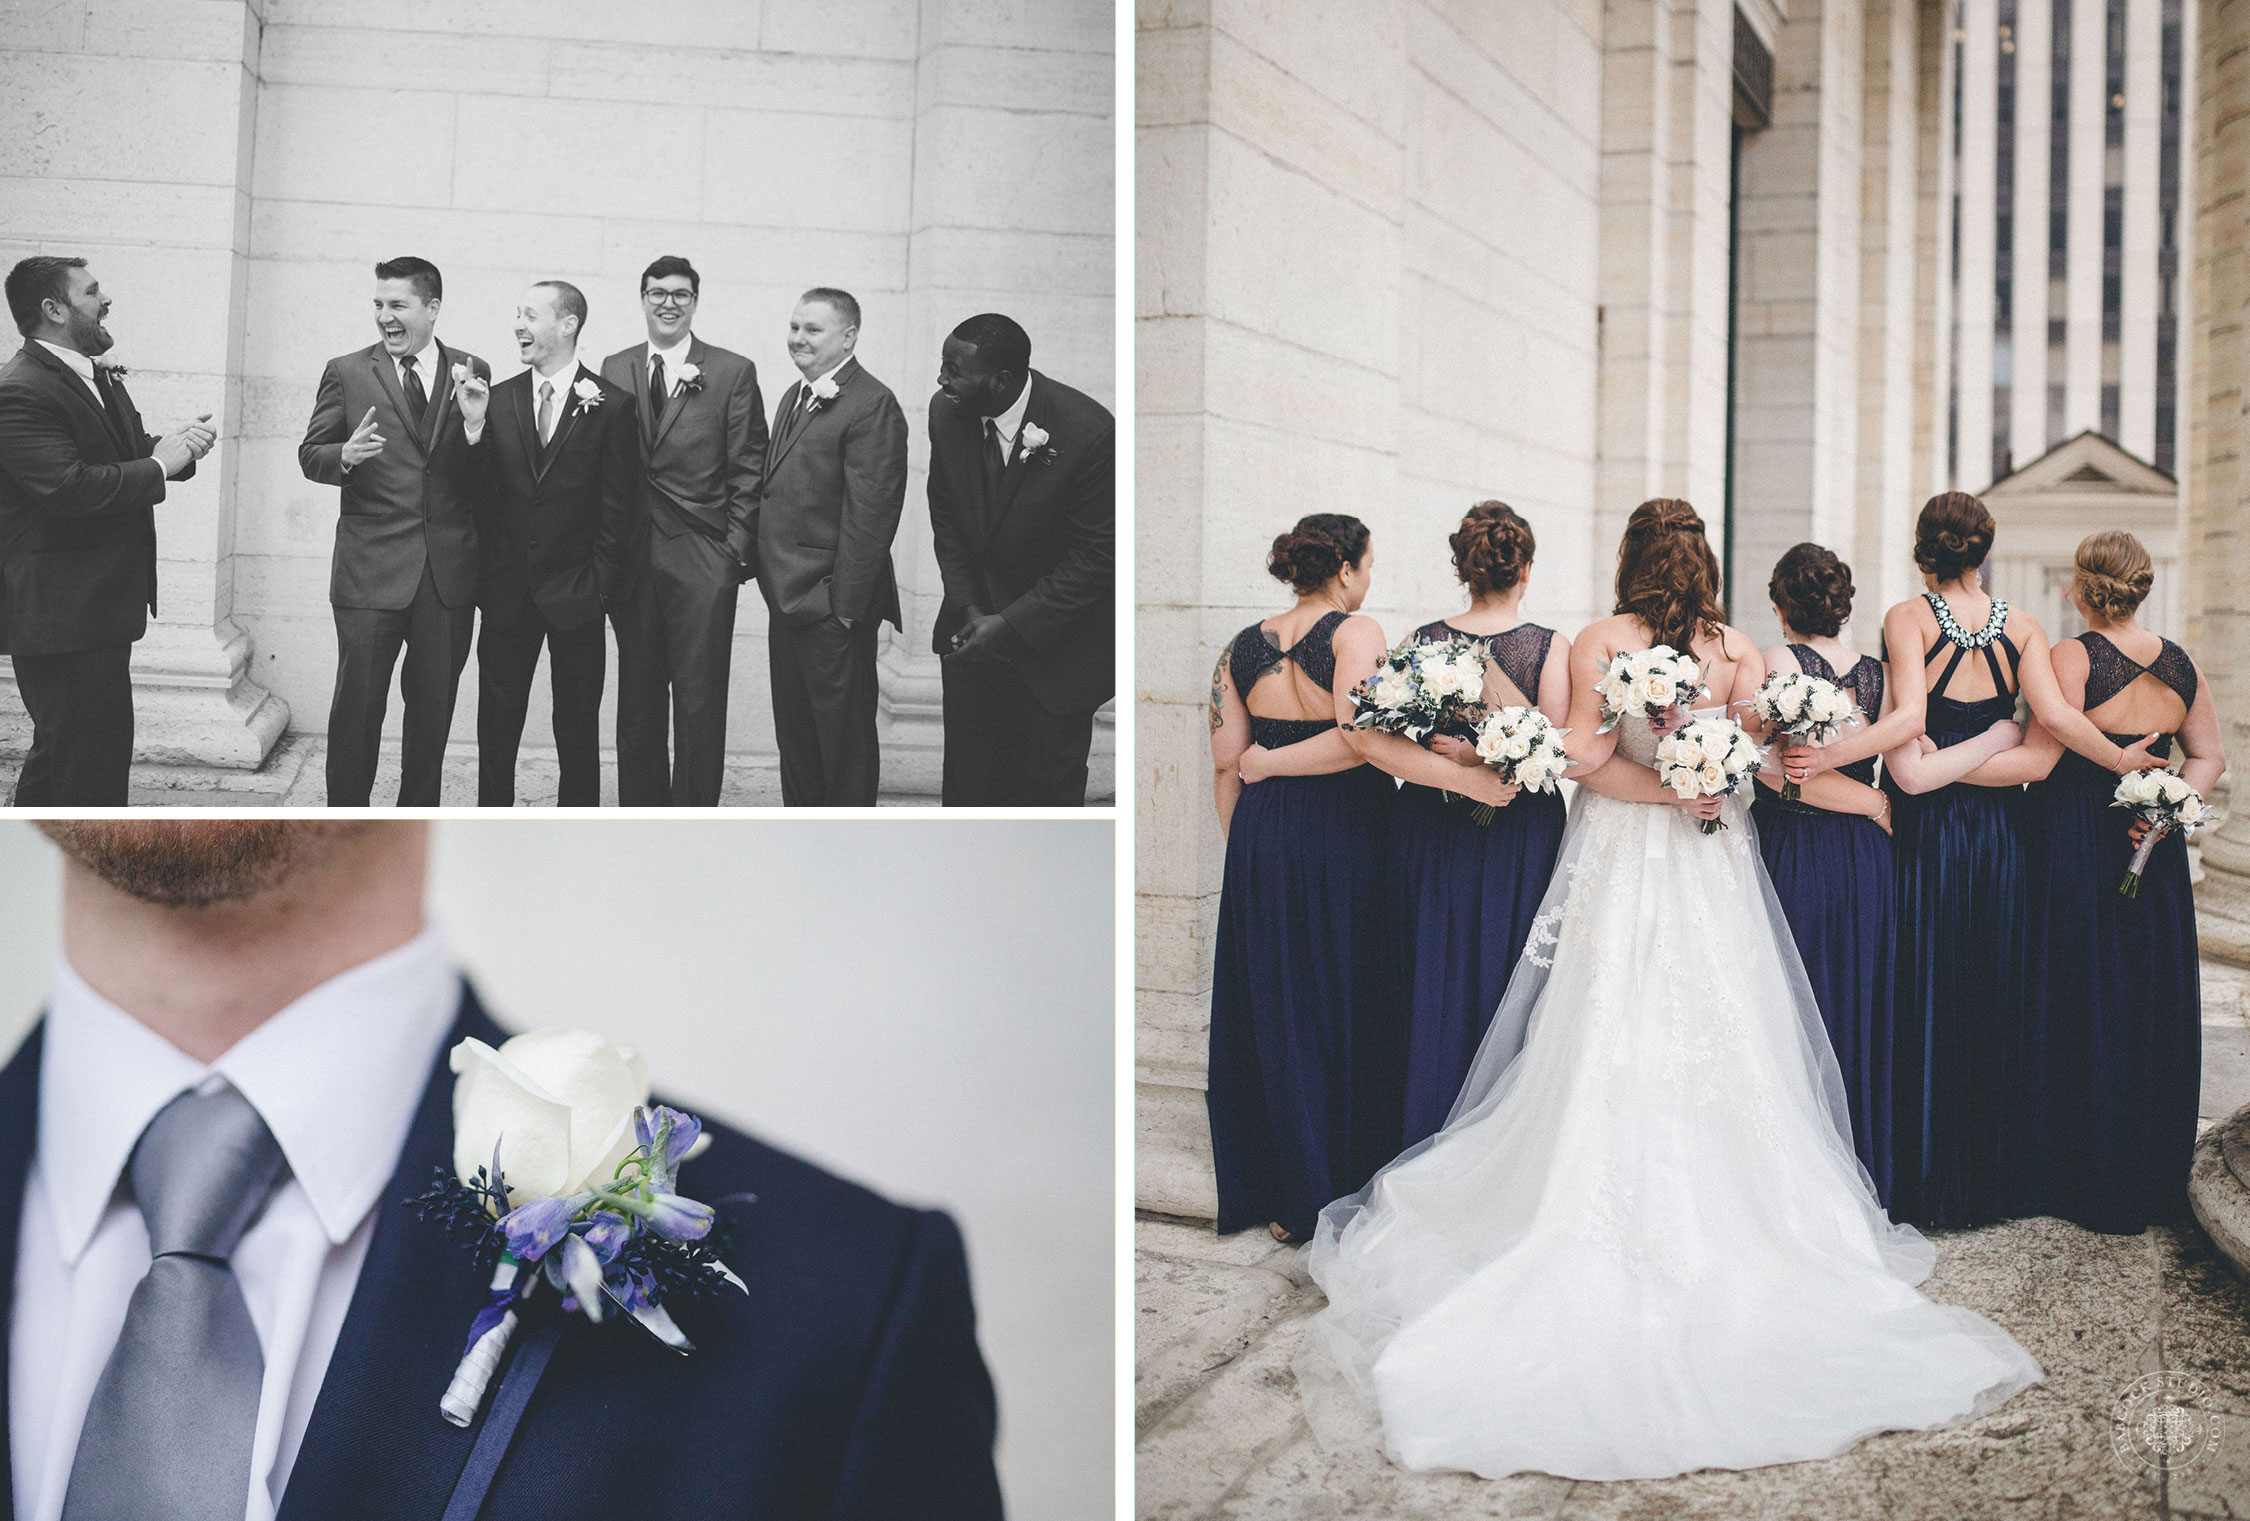 erica-nick-wedding-photographer-dayton-ohio-10.jpg